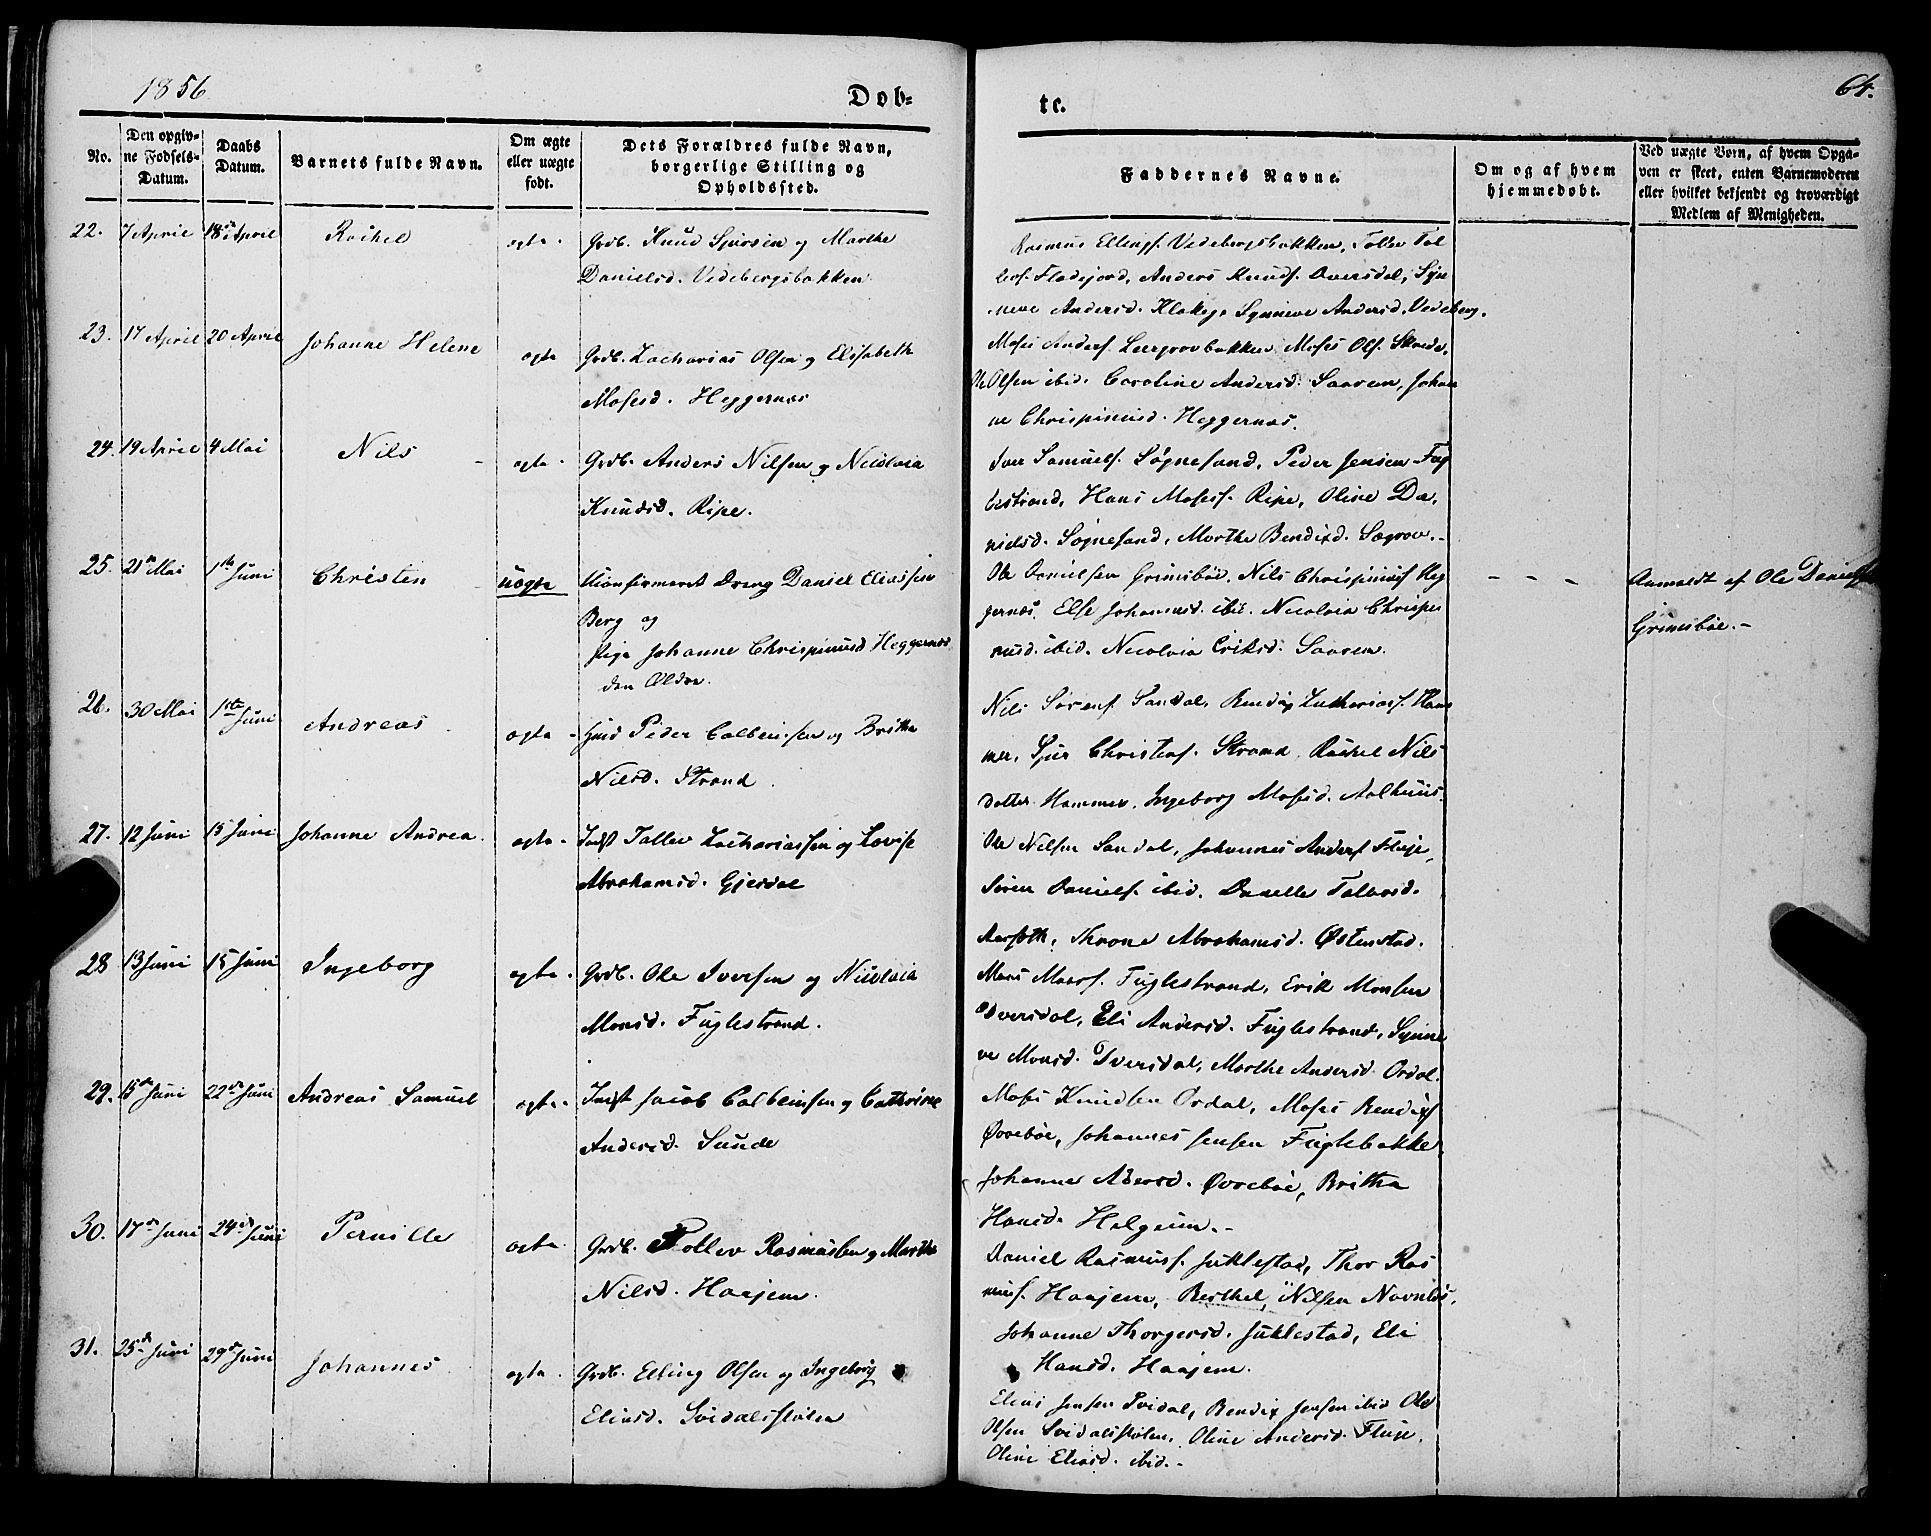 SAB, Jølster sokneprestembete, H/Haa/Haaa/L0010: Parish register (official) no. A 10, 1847-1865, p. 64